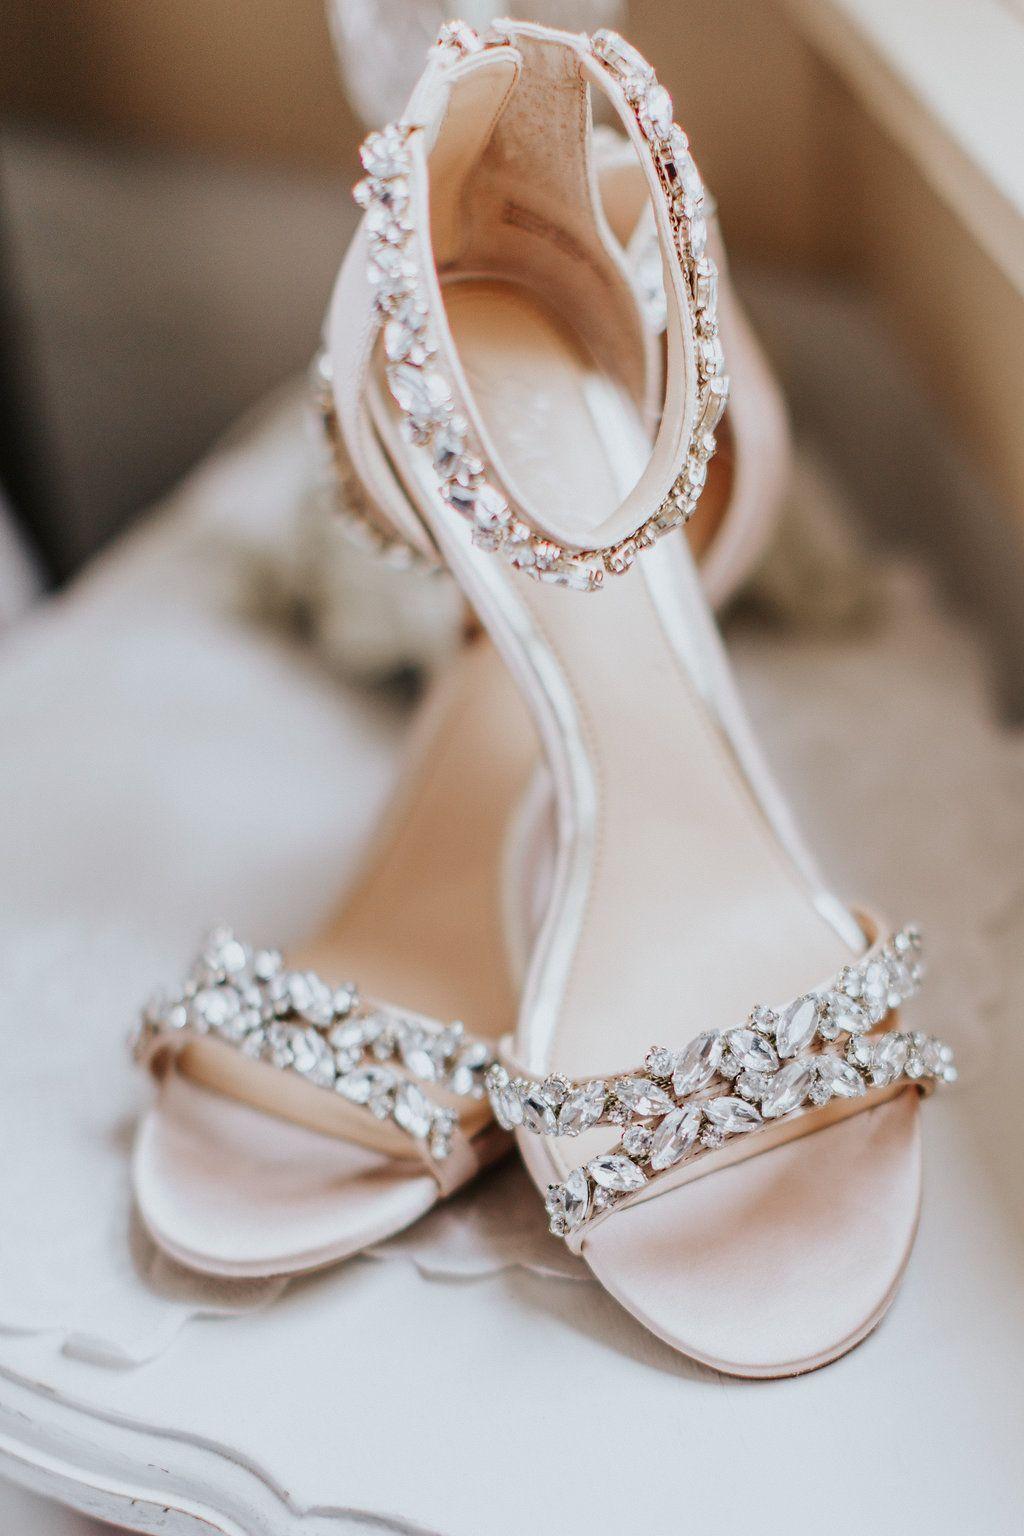 45 Wedding Sandals To Rock Wedding Weddingideas Wedding Shoes Bride Wedding Sandals Wedding Shoes Comfortable